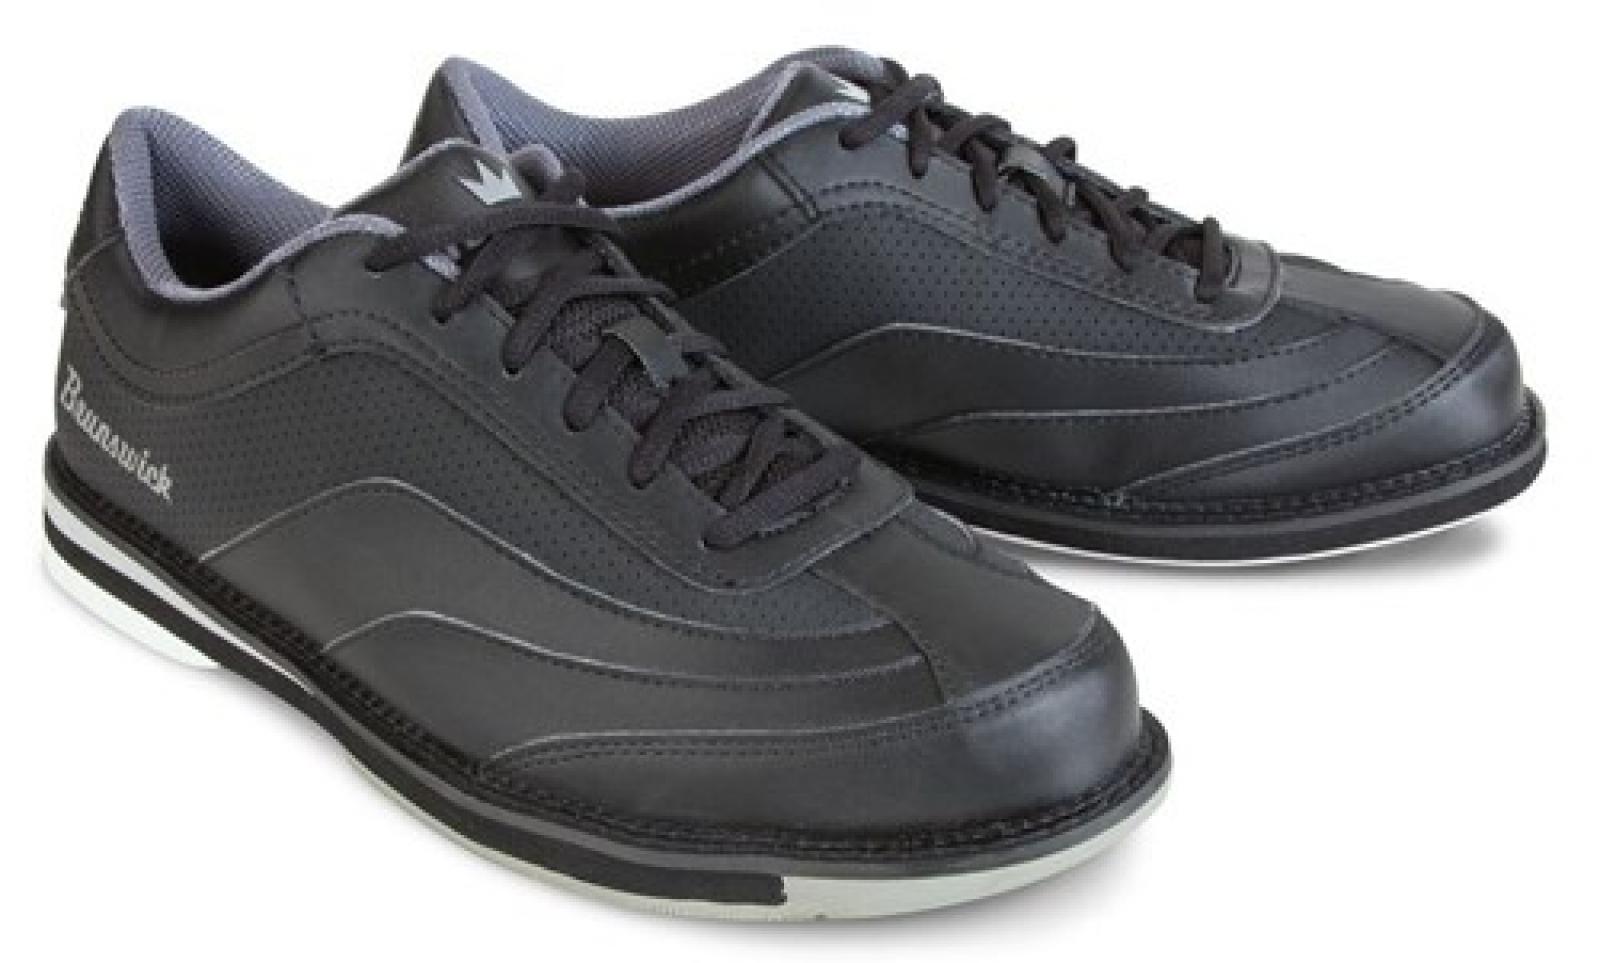 Stylish Mens Bowling Shoes